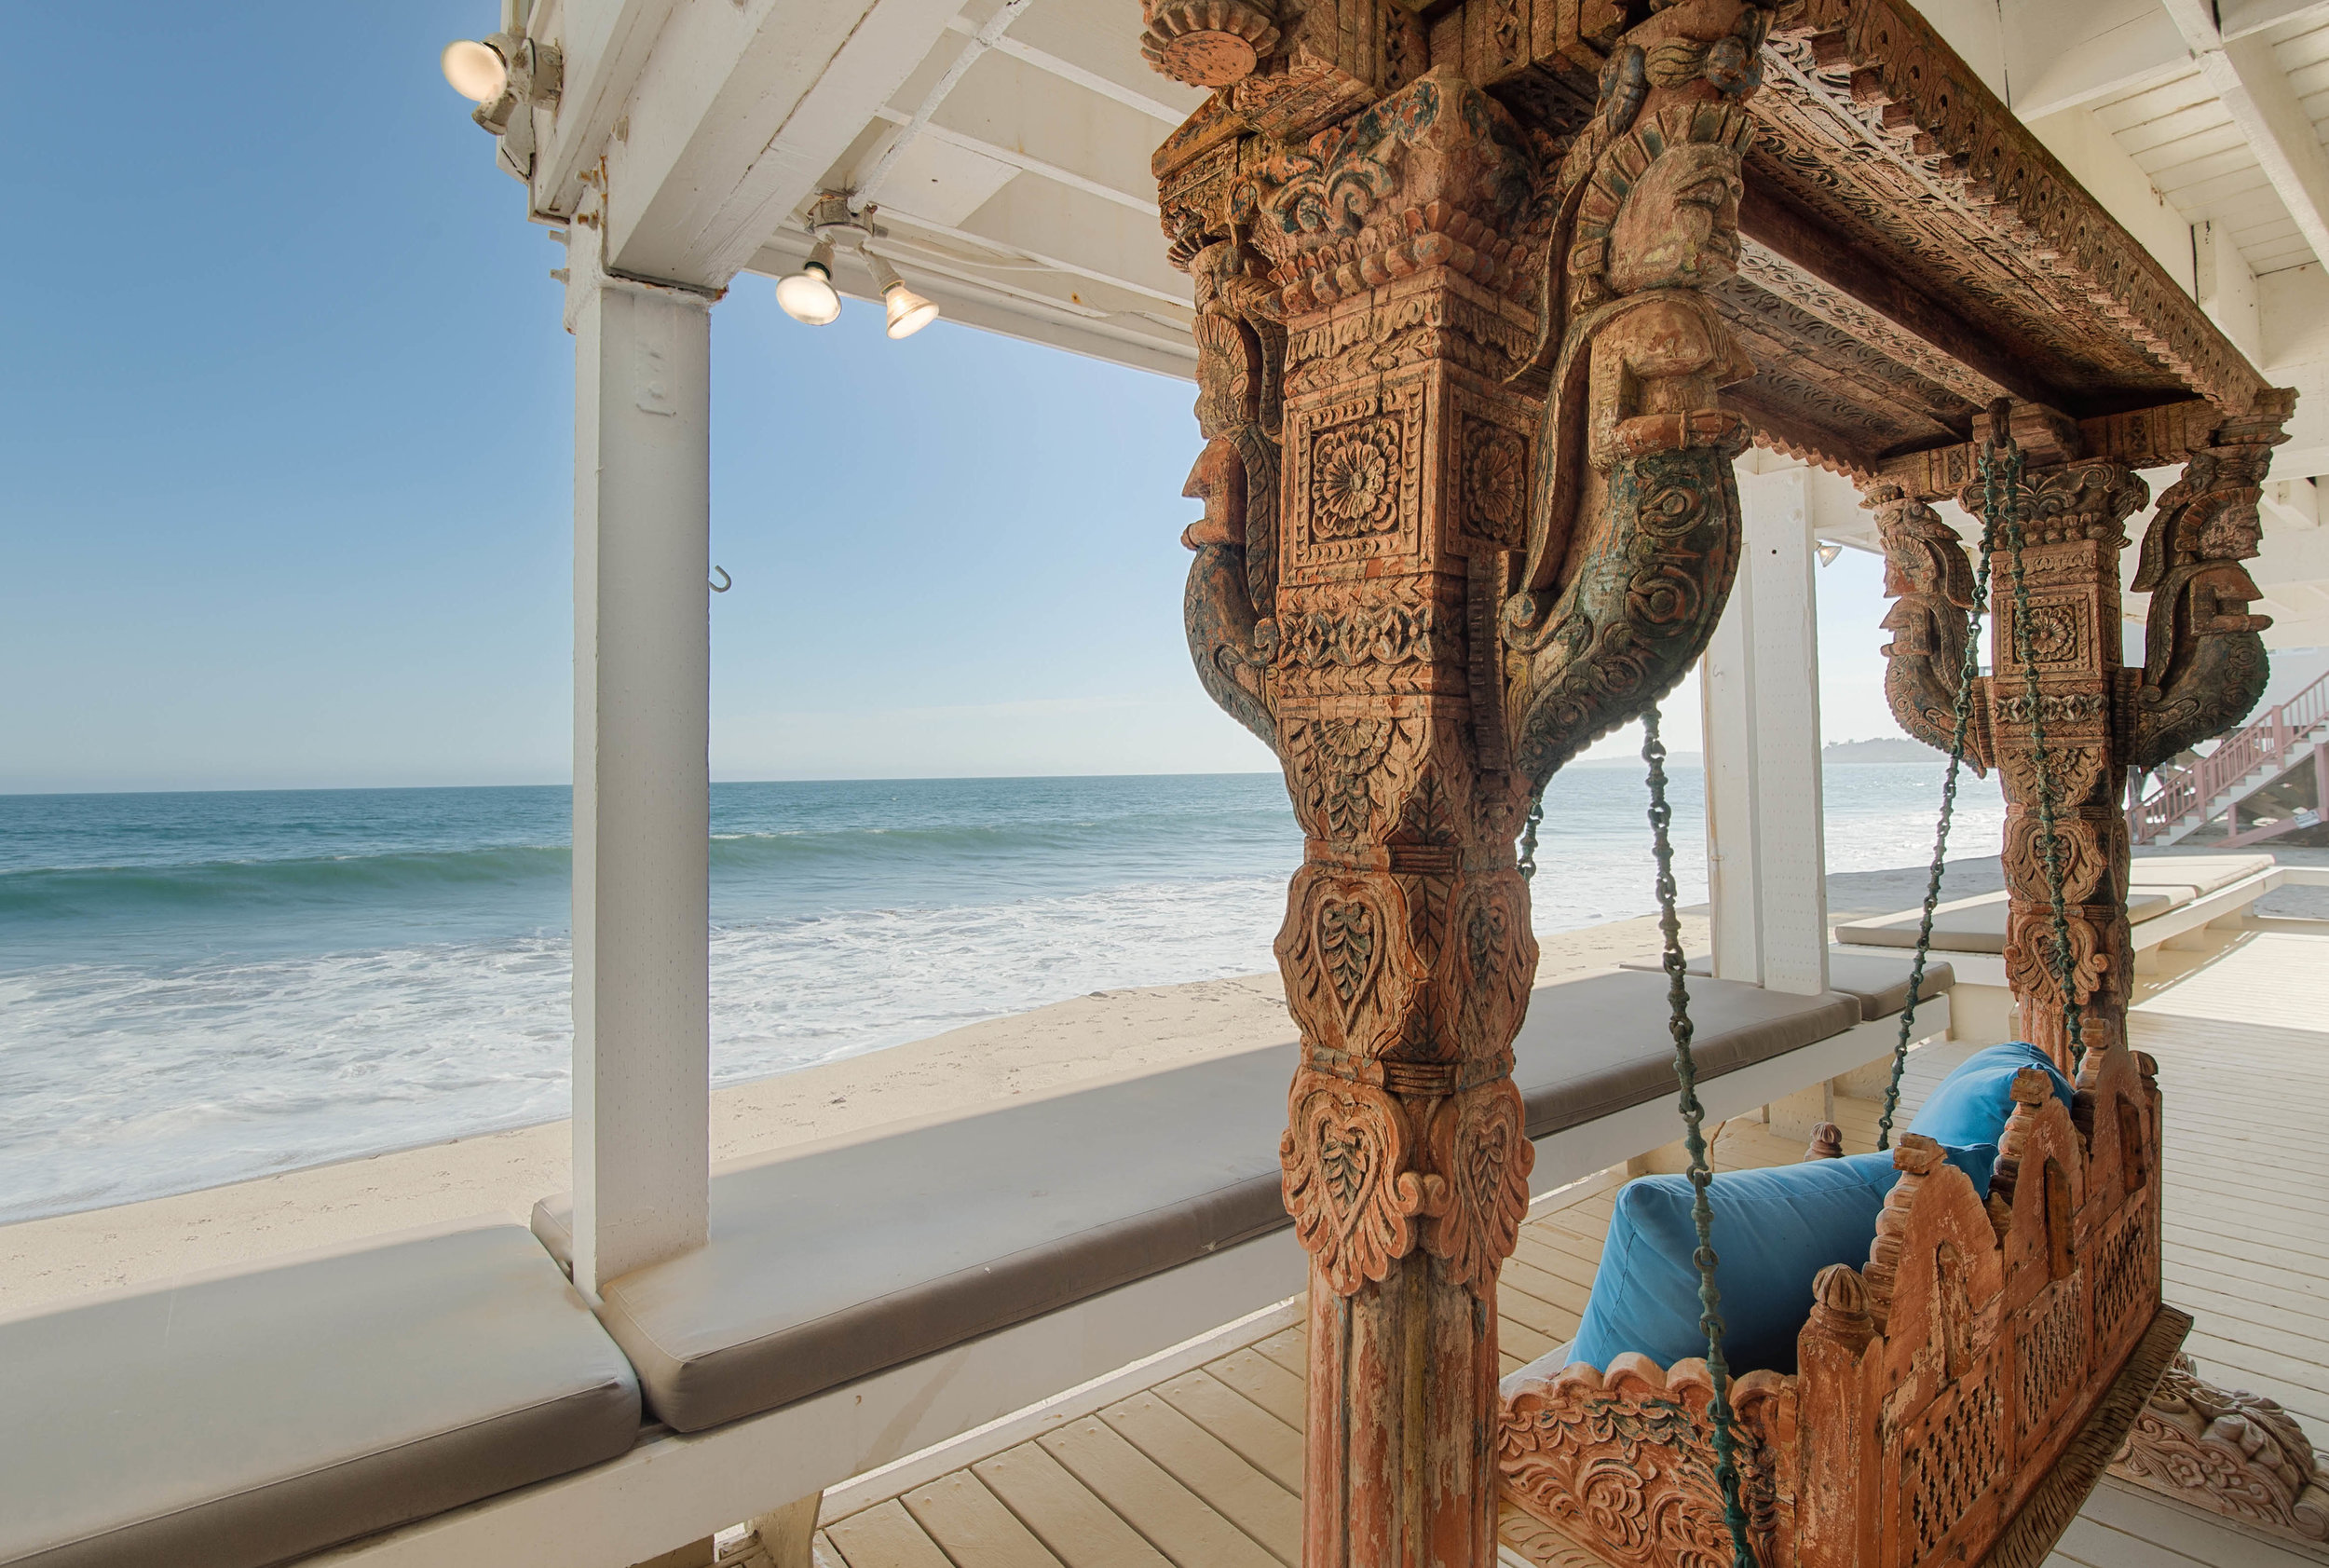 001 Beach Front 25342 Malibu Road For Sale Lease The Malibu Life Team Luxury Real Estate.jpg